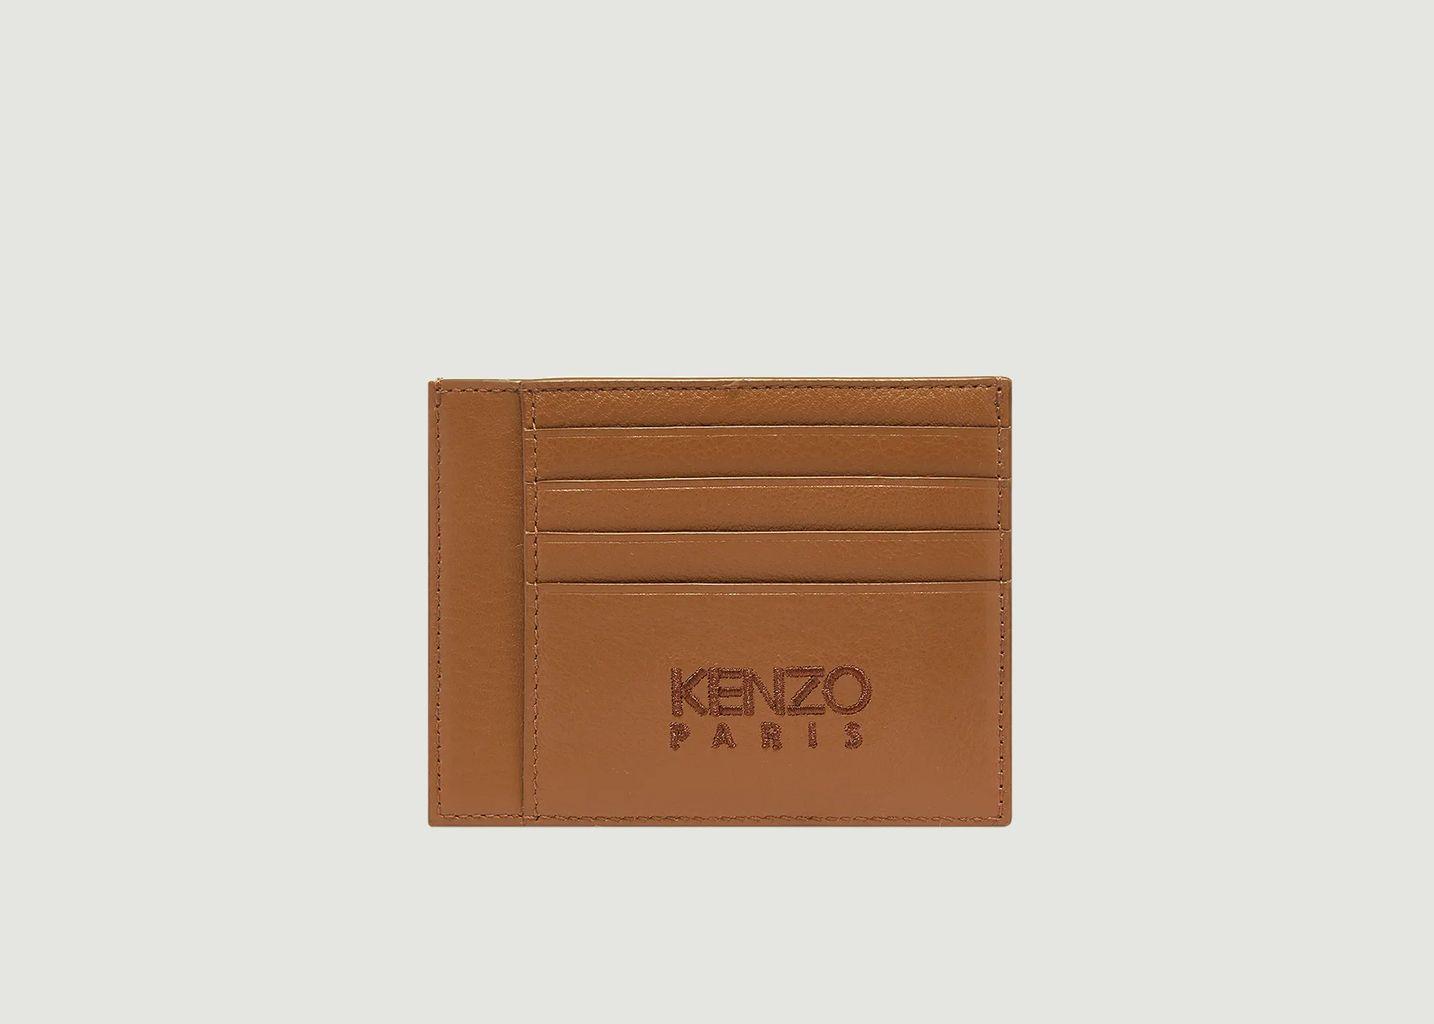 Porte-cartes en cuir siglé - Kenzo